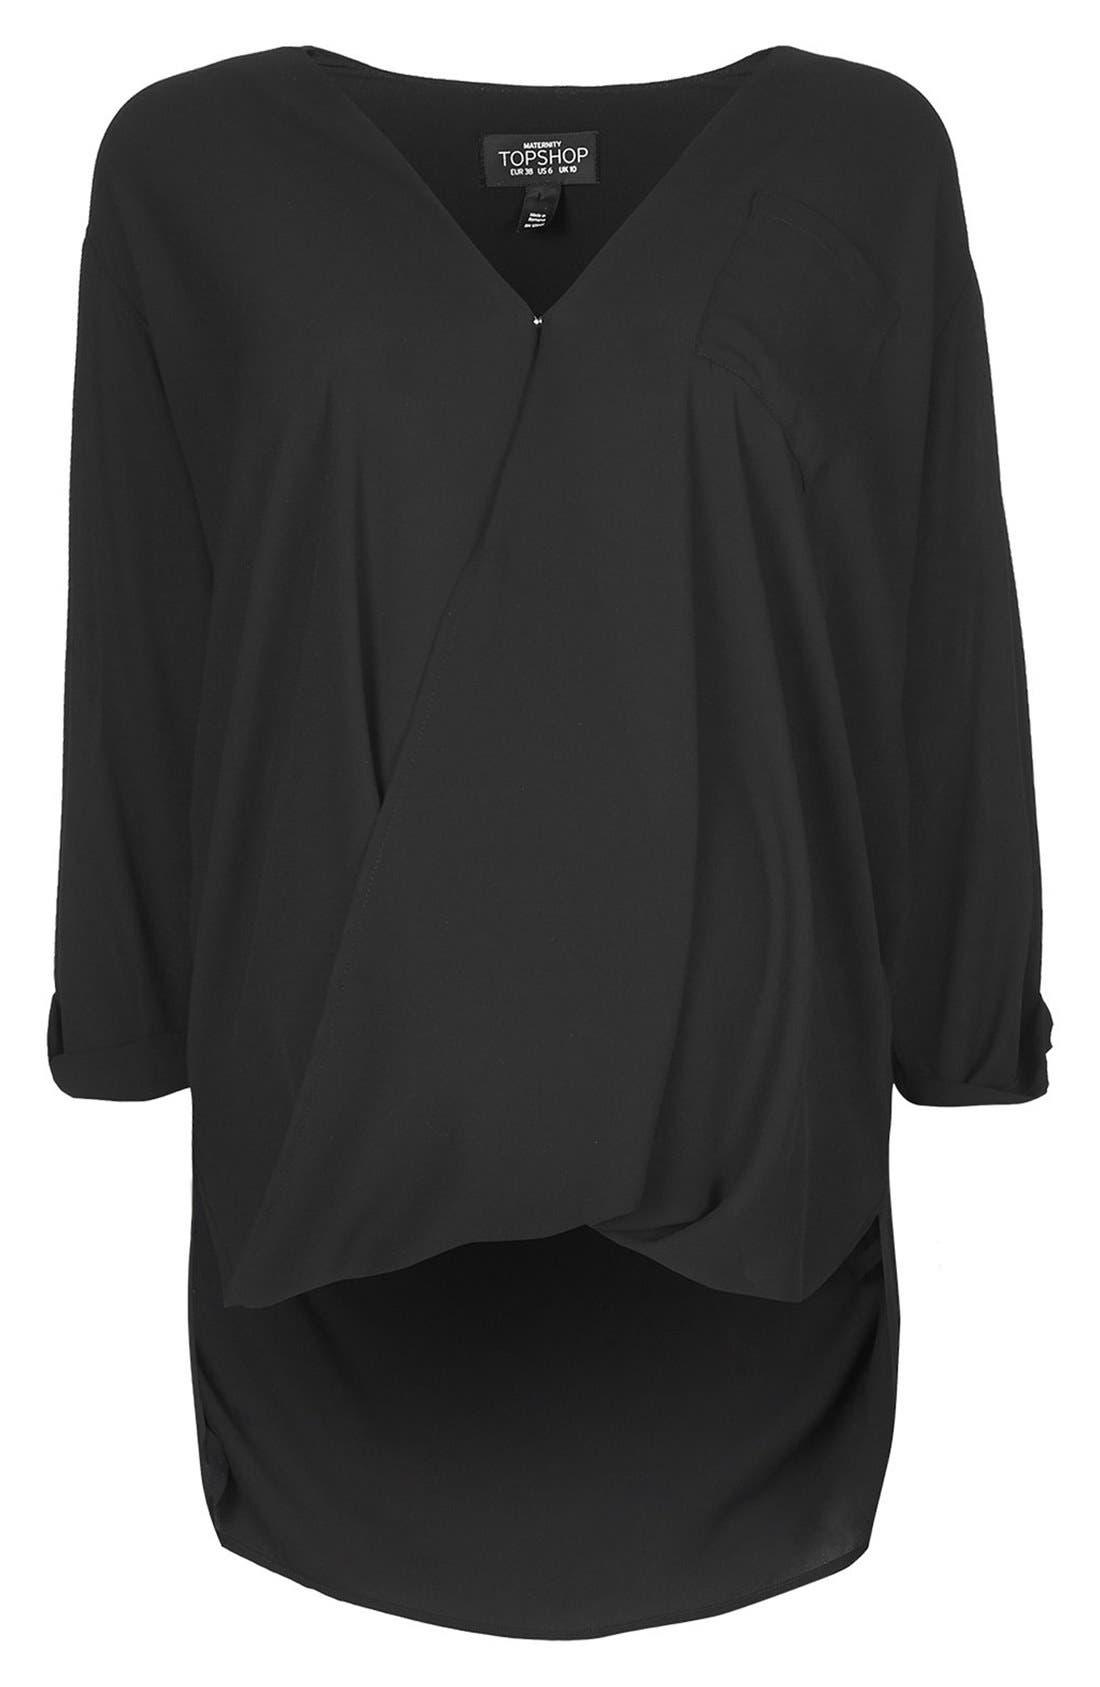 Alternate Image 1 Selected - Topshop Formal Drape Front Maternity Blouse